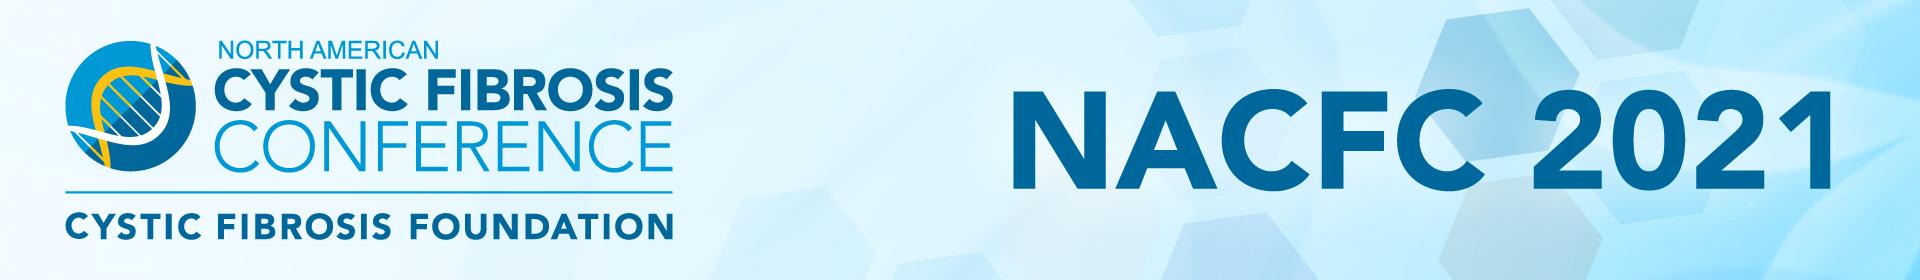 NACFC 2021 Event Banner